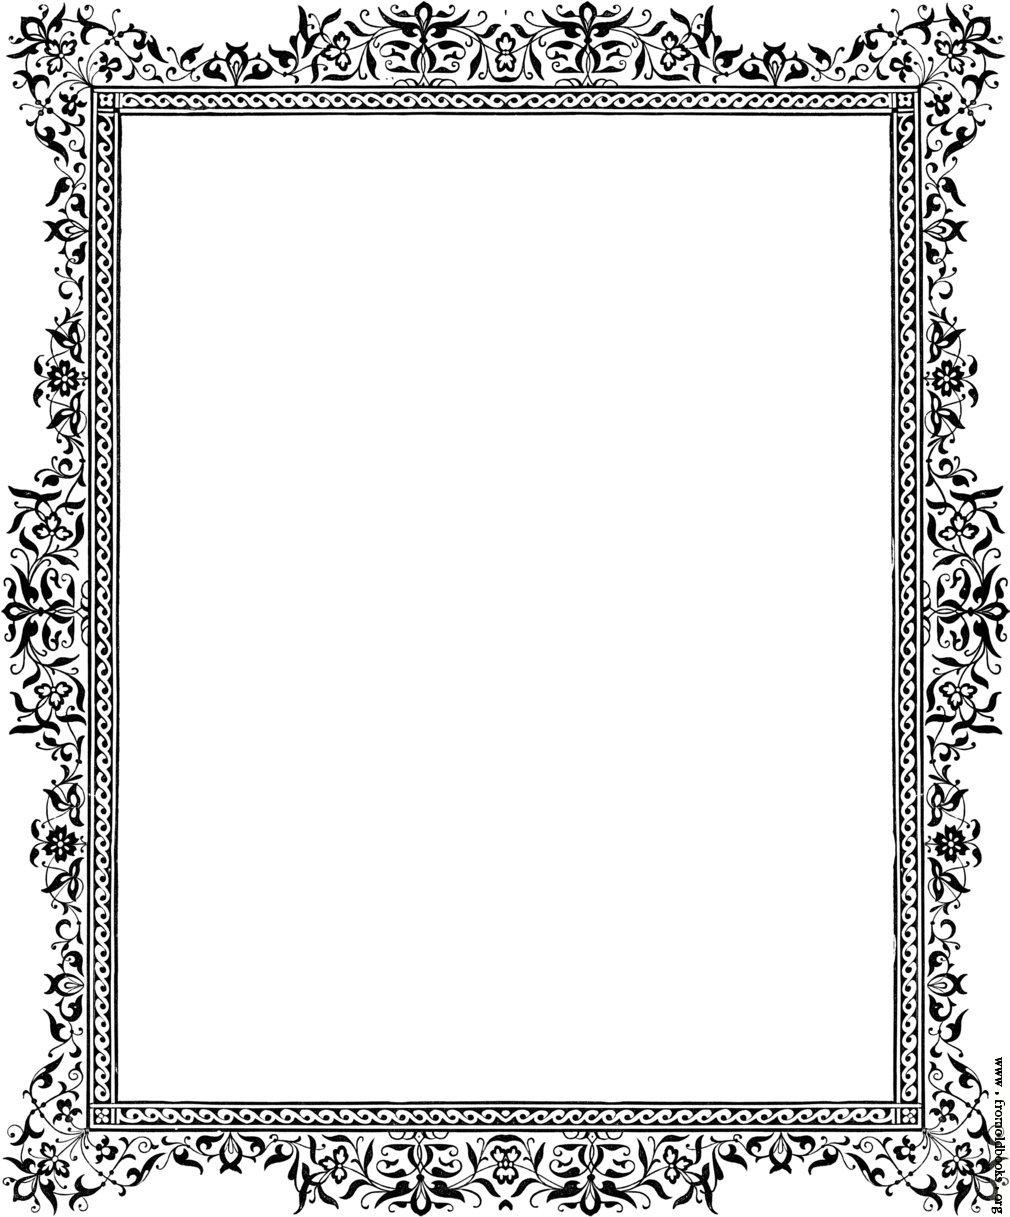 Free Border Clipart Downloads. 40 Stunni-Free Border Clipart Downloads. 40 Stunning Free Clip Art ..-13